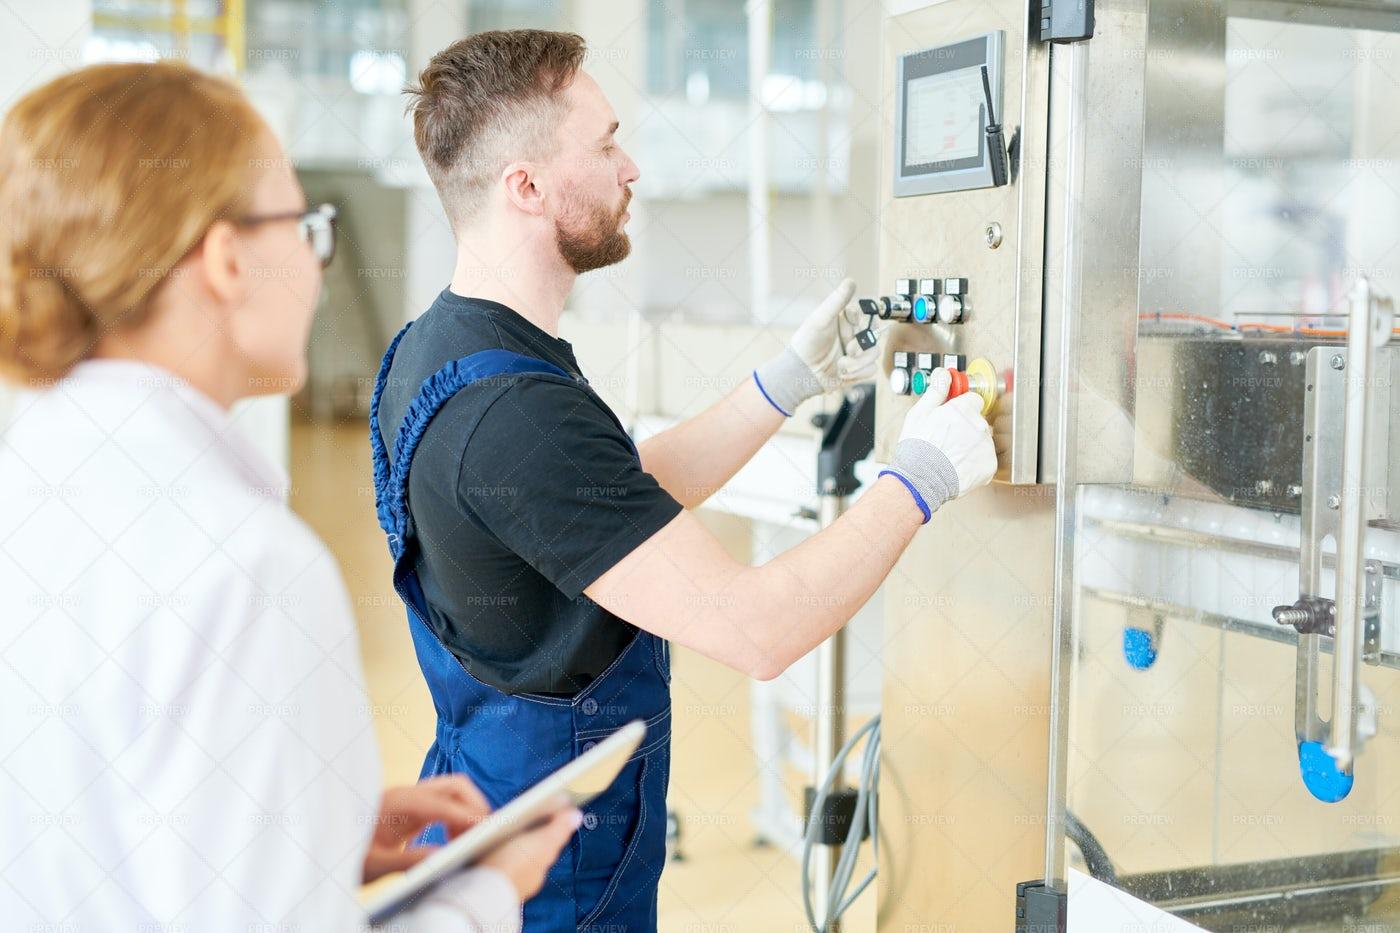 Adjusting Equipment At Dairy...: Stock Photos